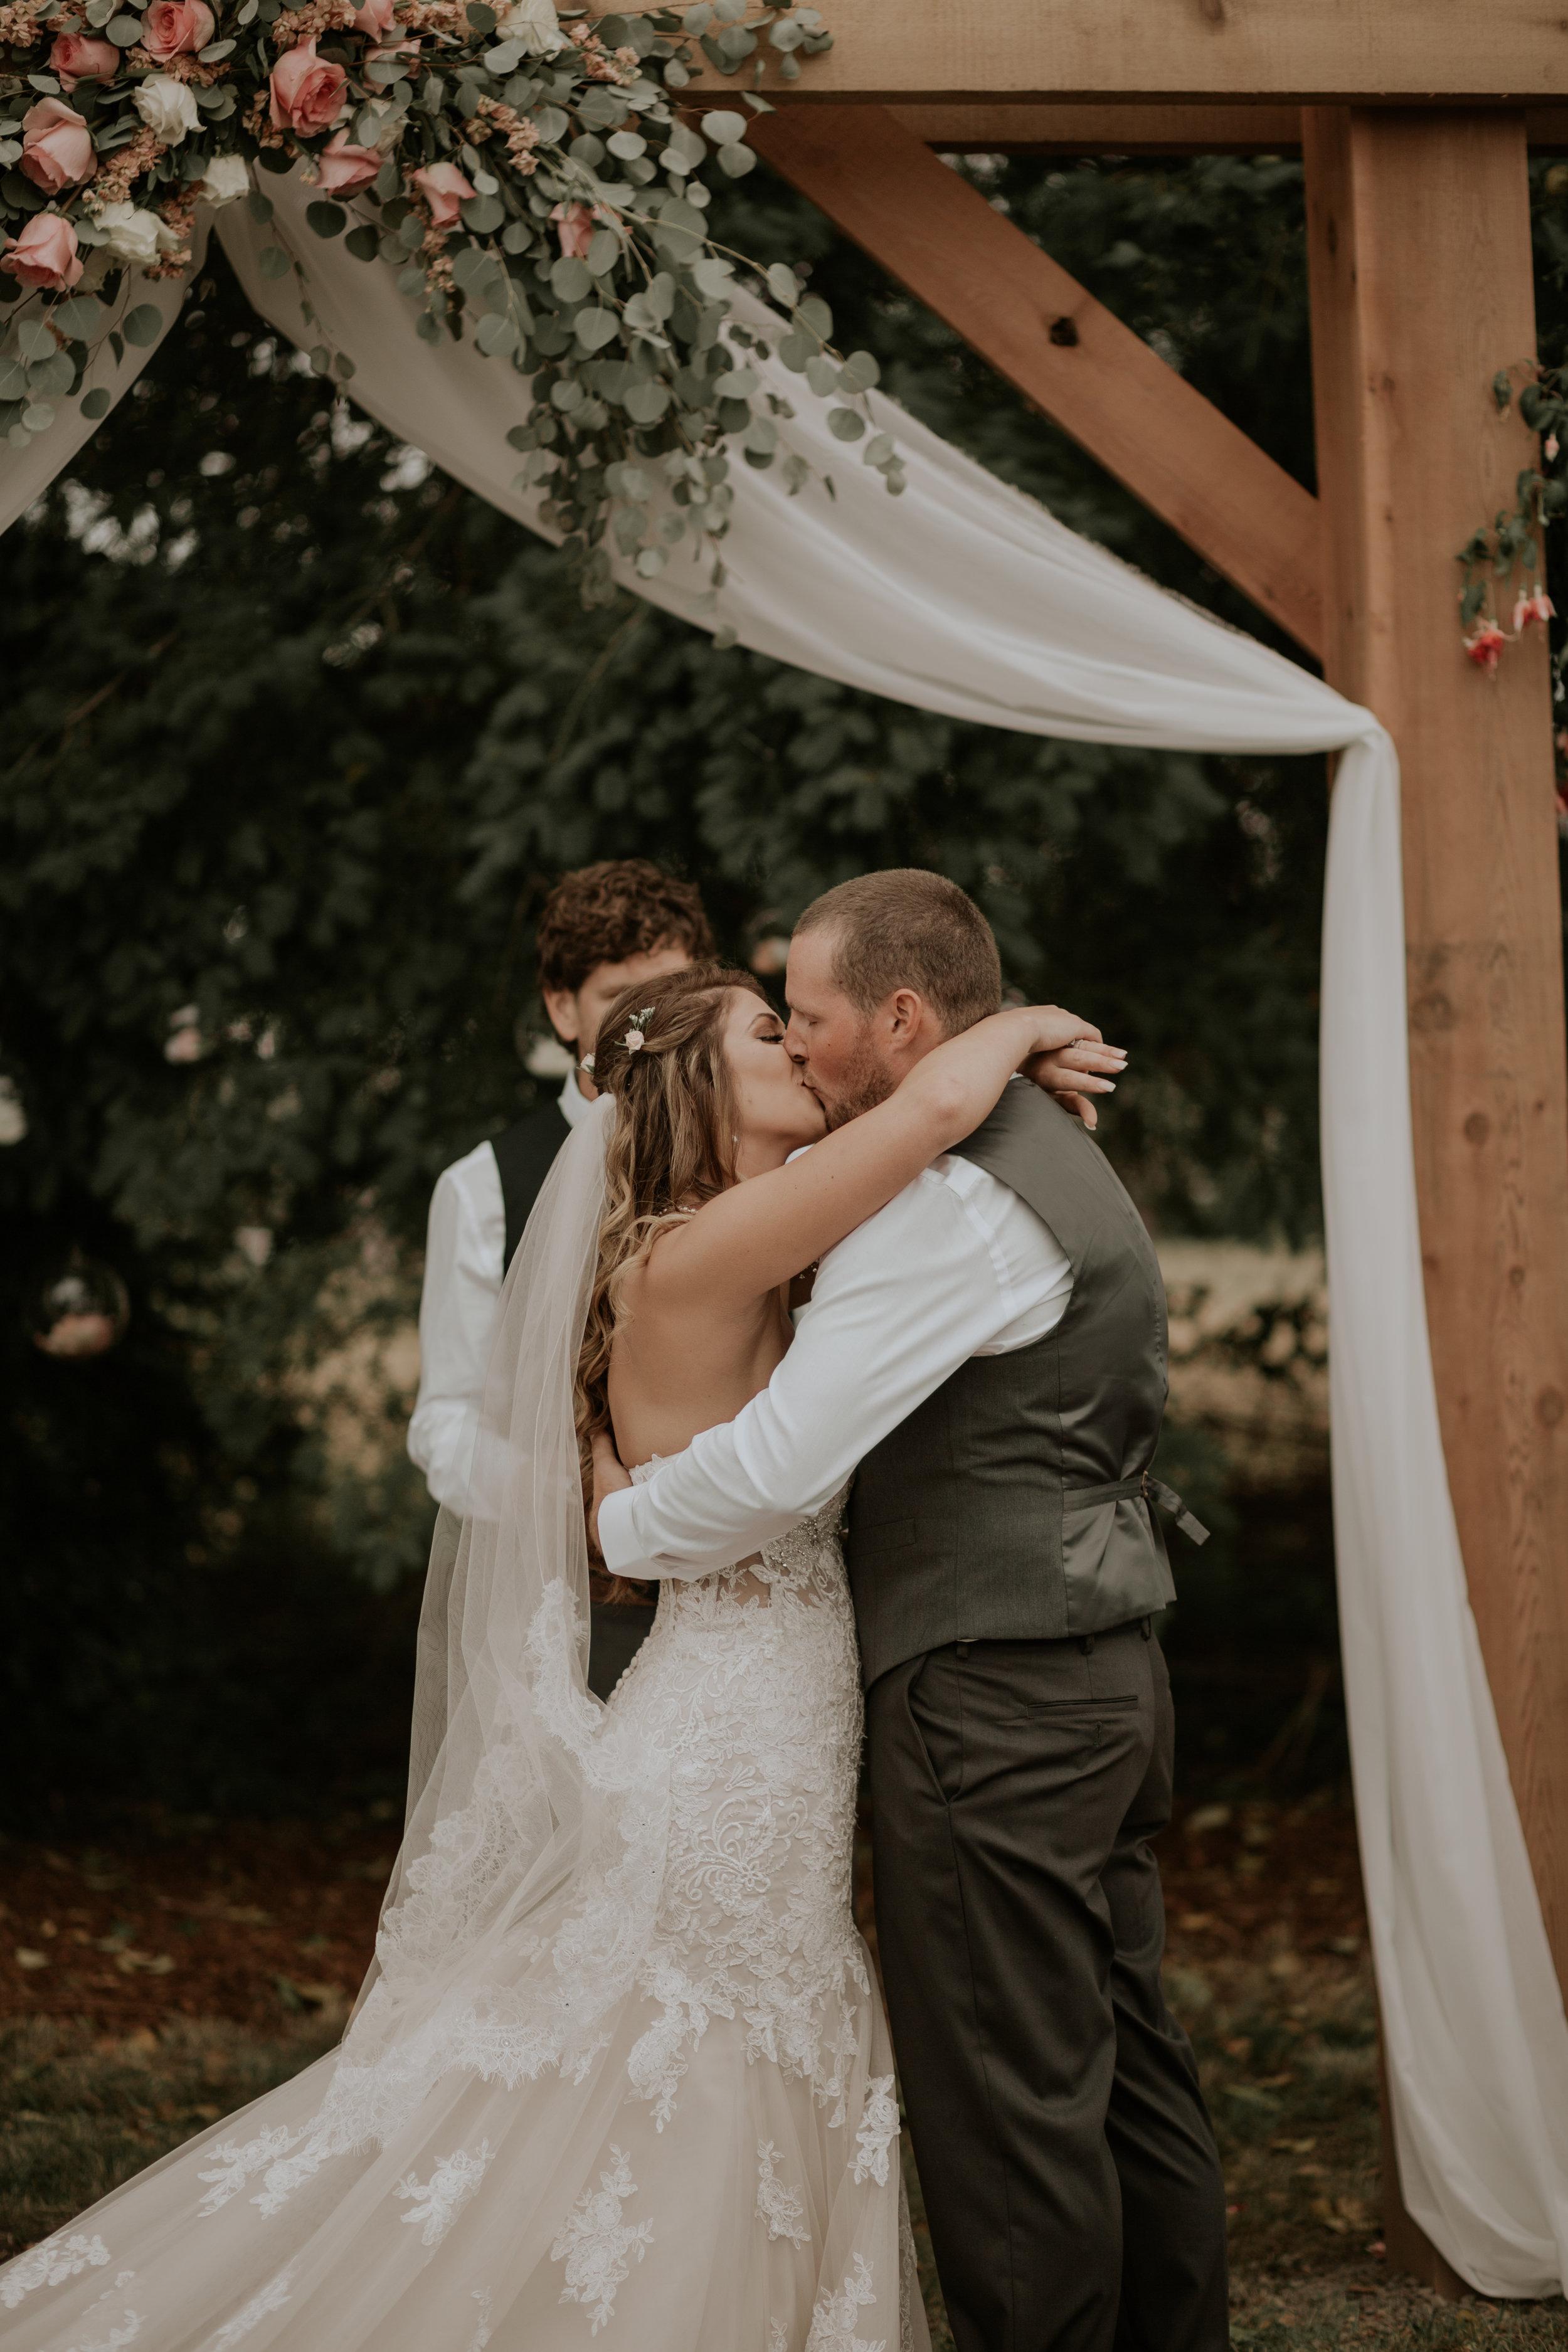 Olympic-Peninsula-Wedding-Photographer-PNW-Forks-Port-Angeles-Kayla-Dawn-Photography-engagement-Olympic-National-Park-53.jpg